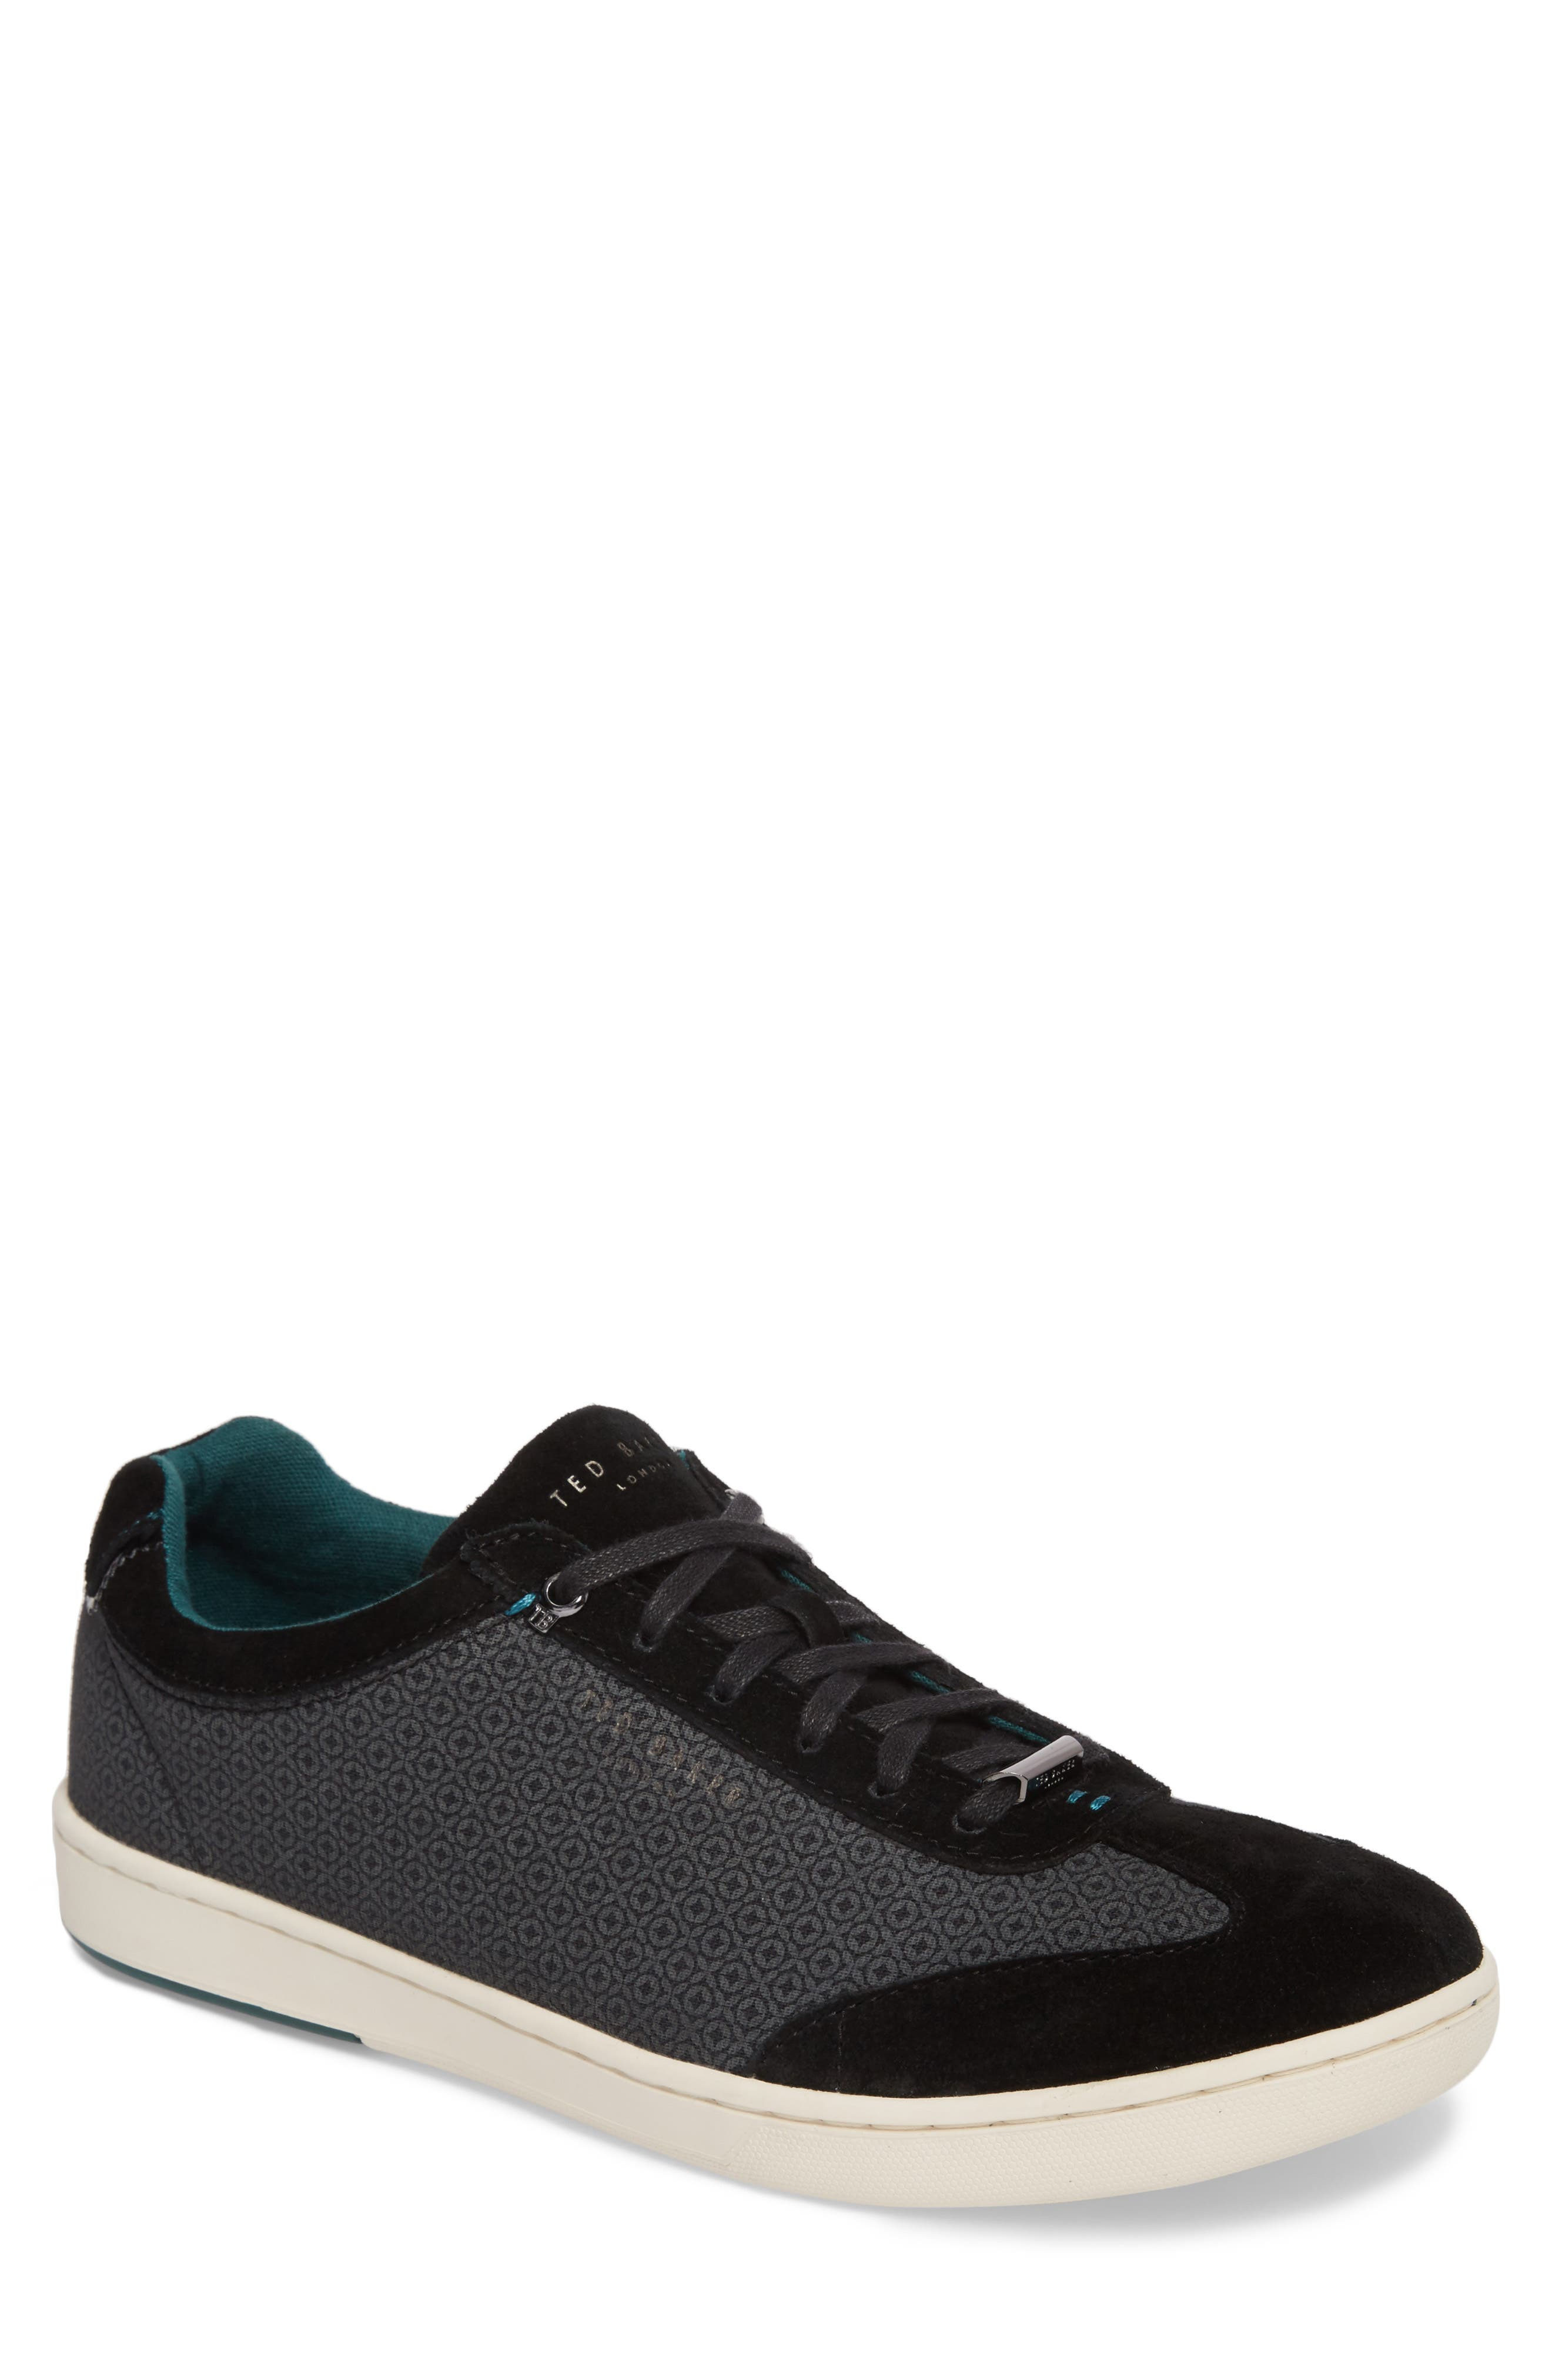 Kiefer Sneaker,                             Main thumbnail 1, color,                             011